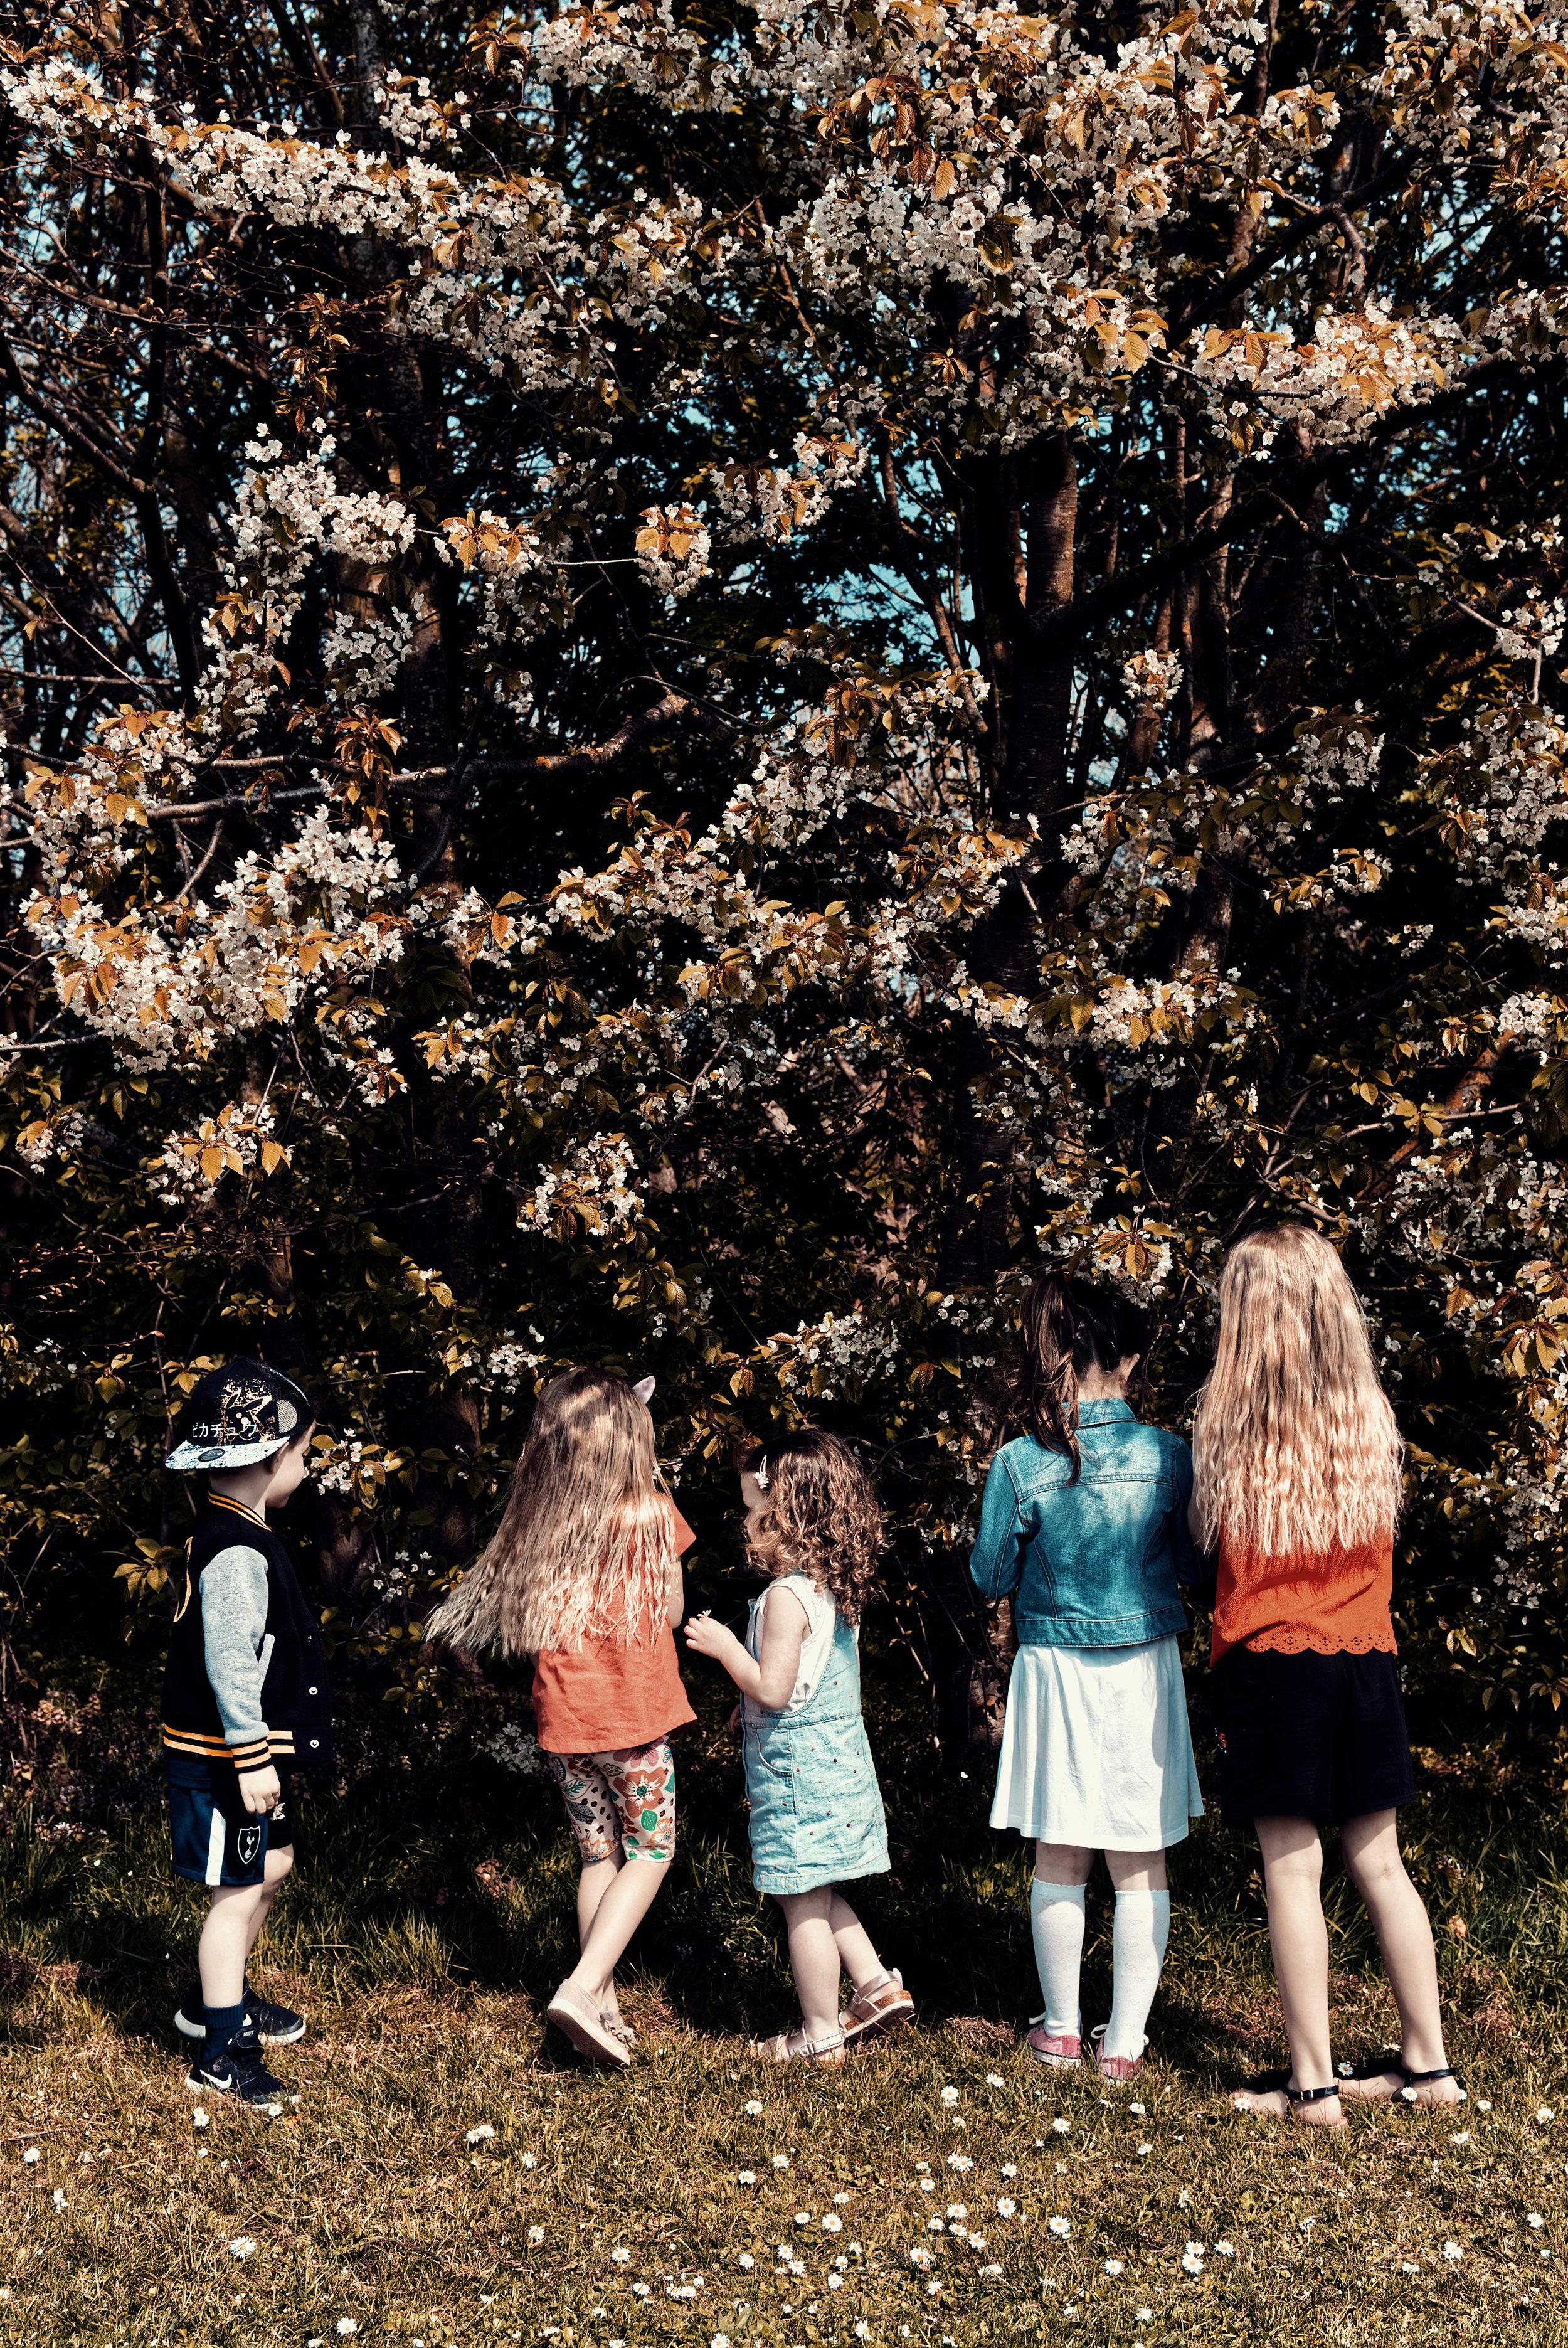 Childrens Photographer Luke Batchelor Productions